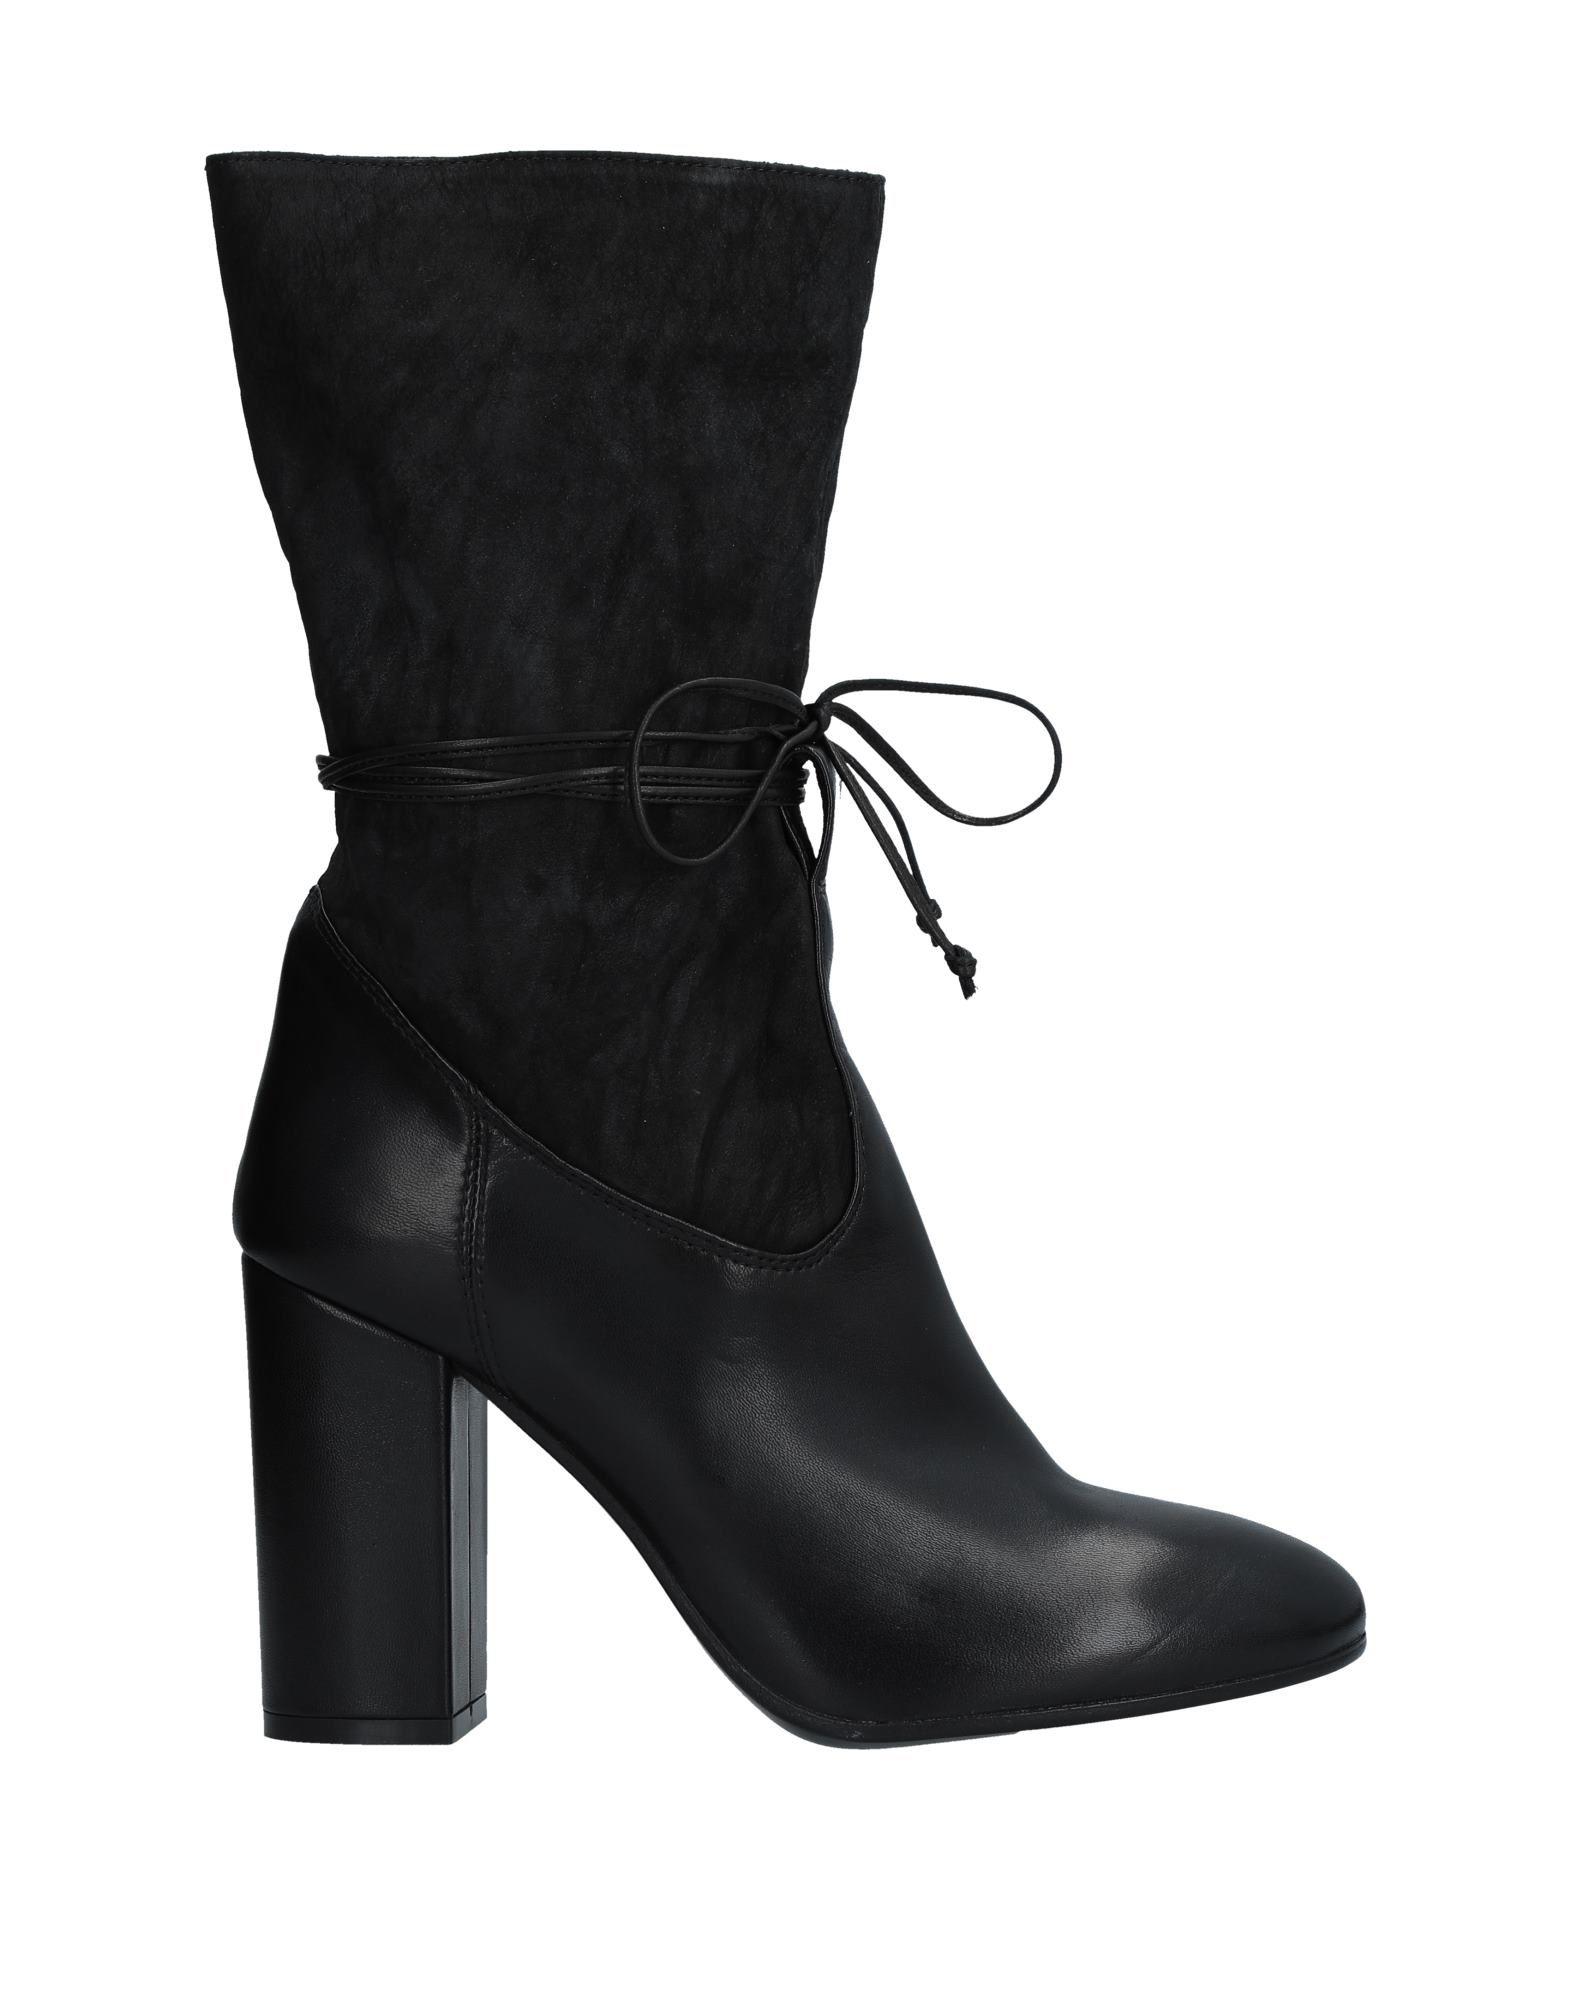 FIORIFRANCESI Ankle Boot in Black